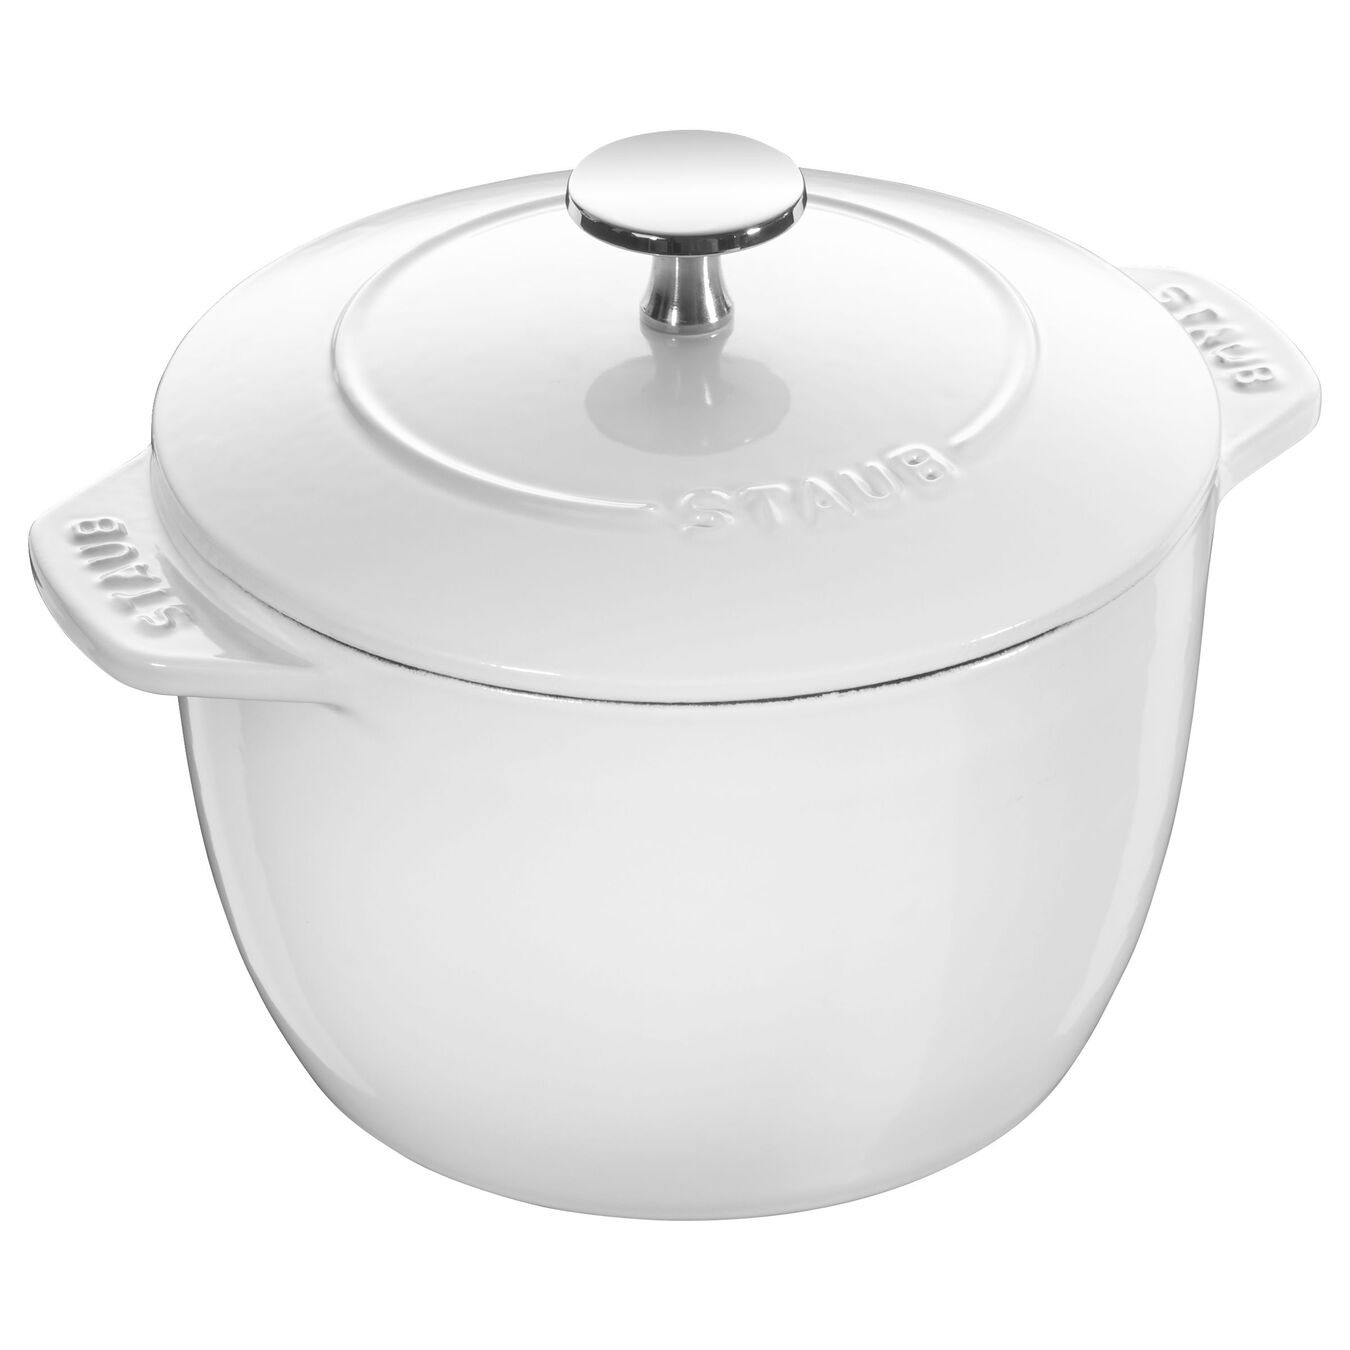 1.5-qt Petite French Oven - Matte White,,large 1